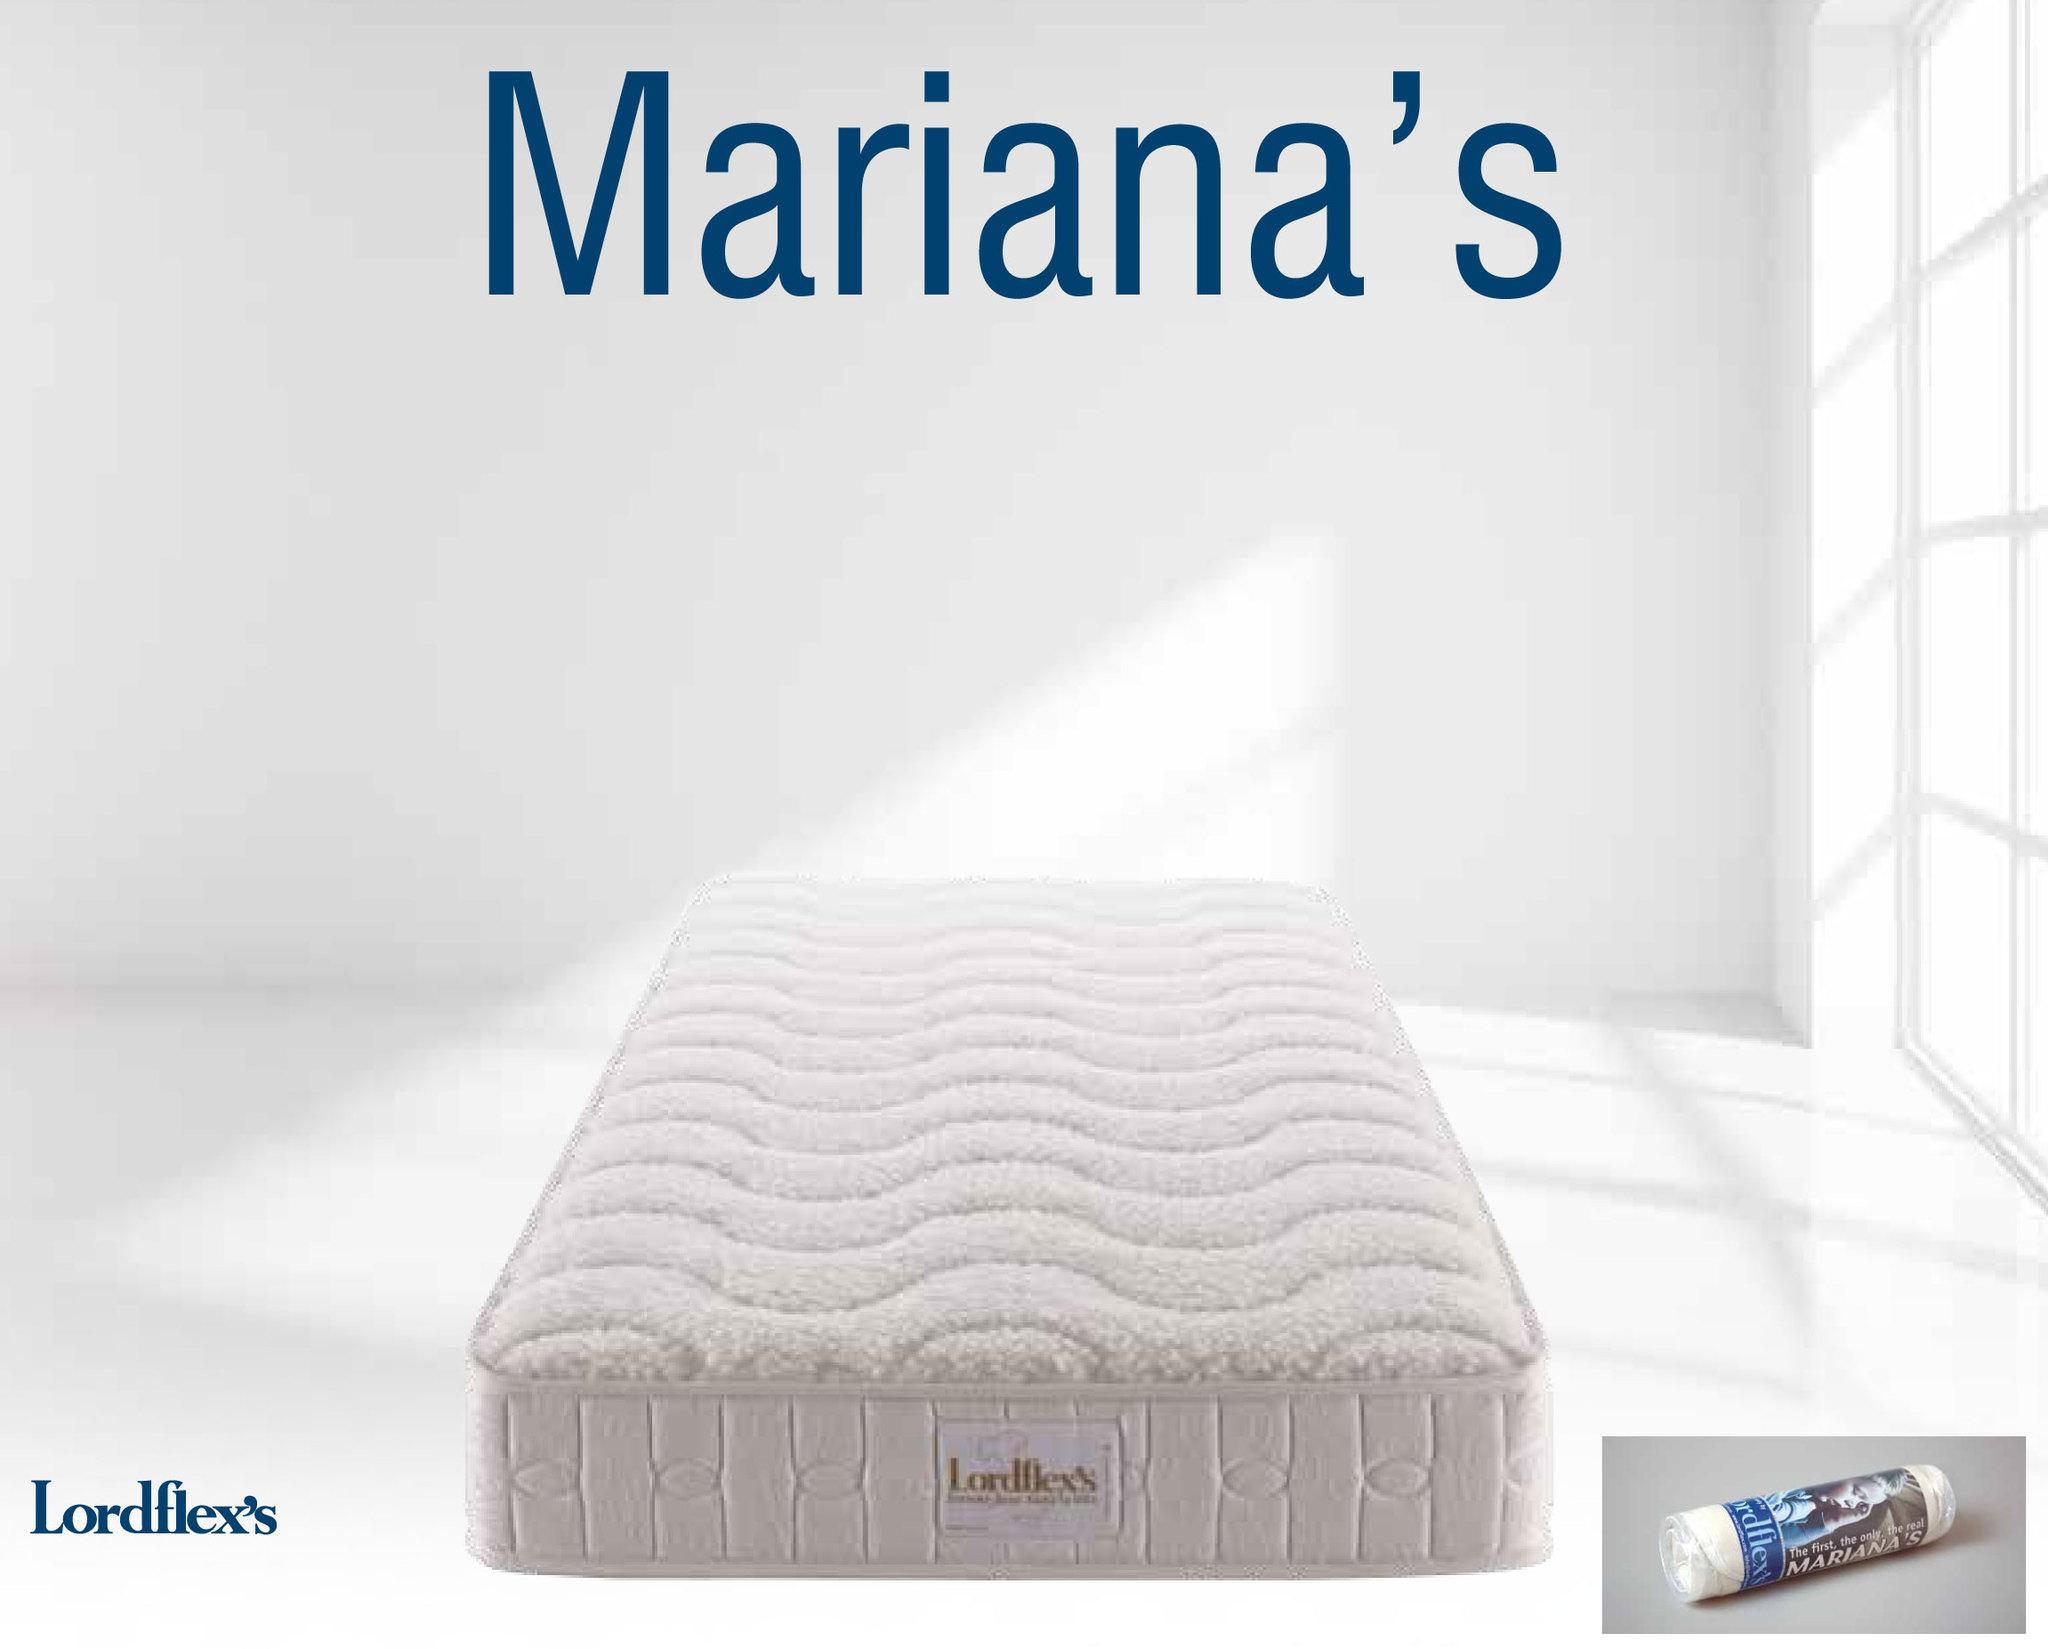 Матрасы Матрас ортопедический Lordflex's Mariana's 165х200 до 140 кг 1_Mariana_s.jpg